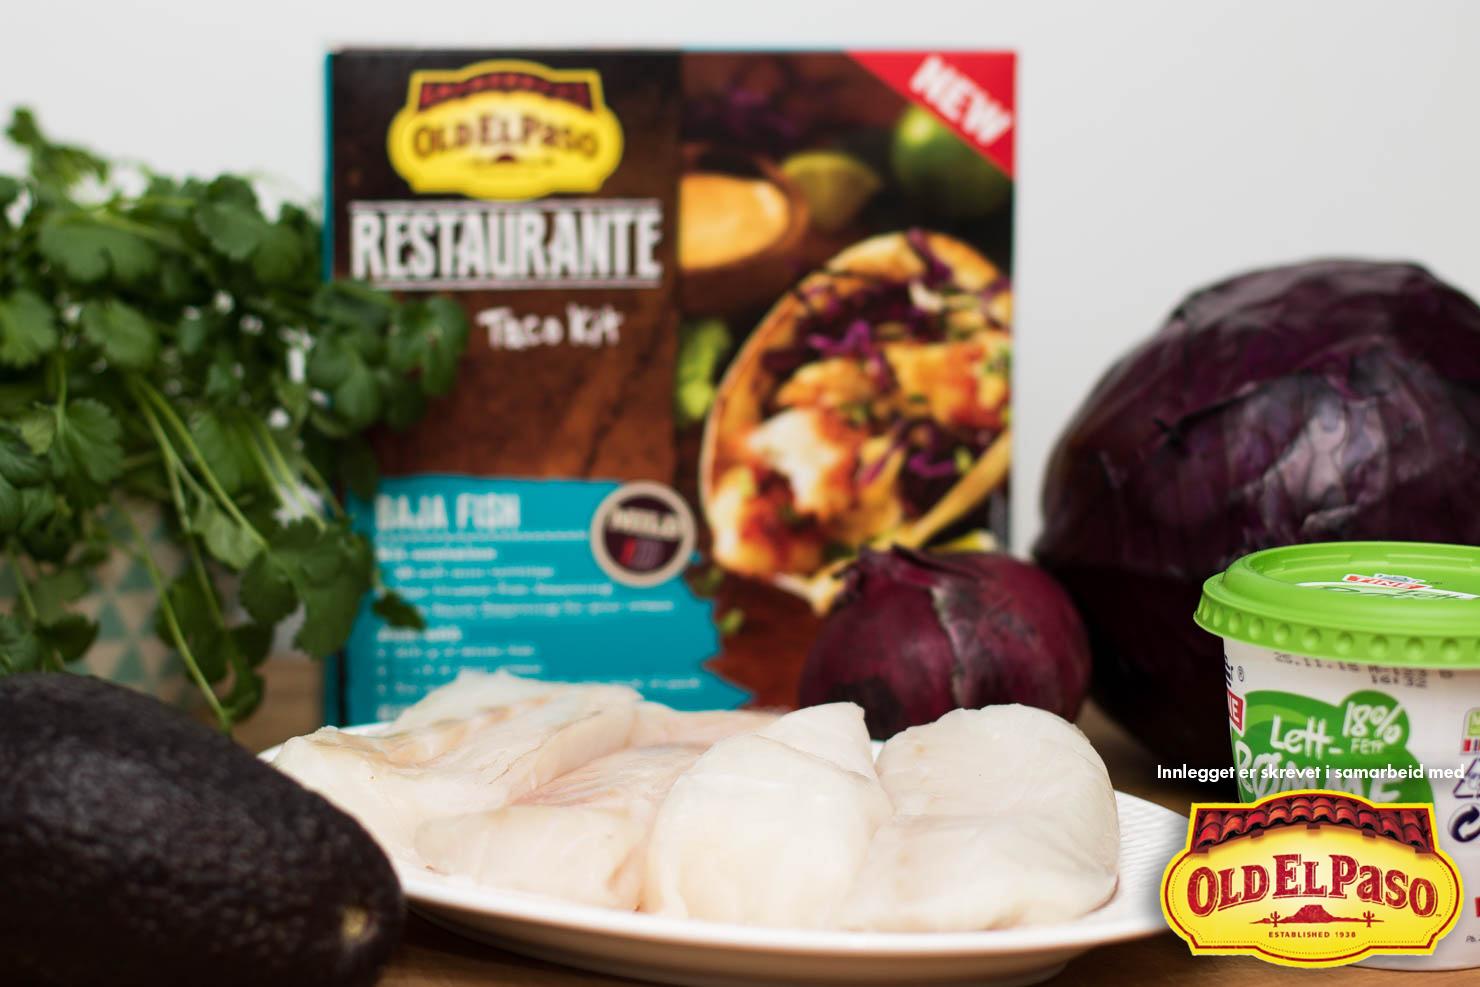 Ingredienser | Baja fish | Old El Paso